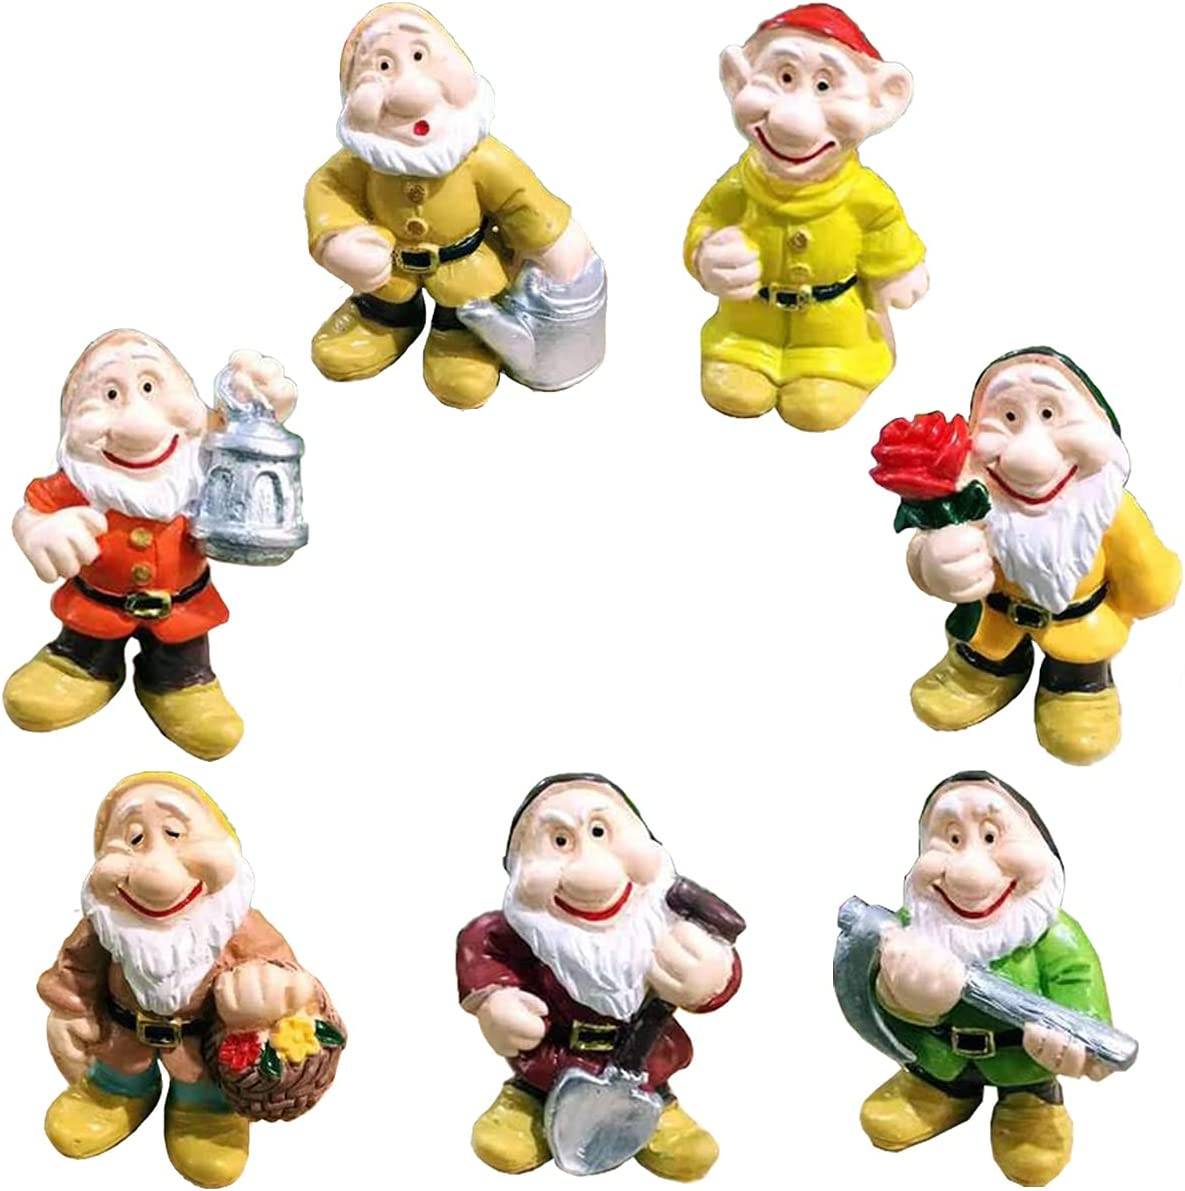 MIBUNG 7pcs Mini Garden Gnomes Statues - Miniature Fairy Garden Decor Accessories Funny Dwarf Gnomes Figurines Ornaments for Fairy Garden House Decoration, B